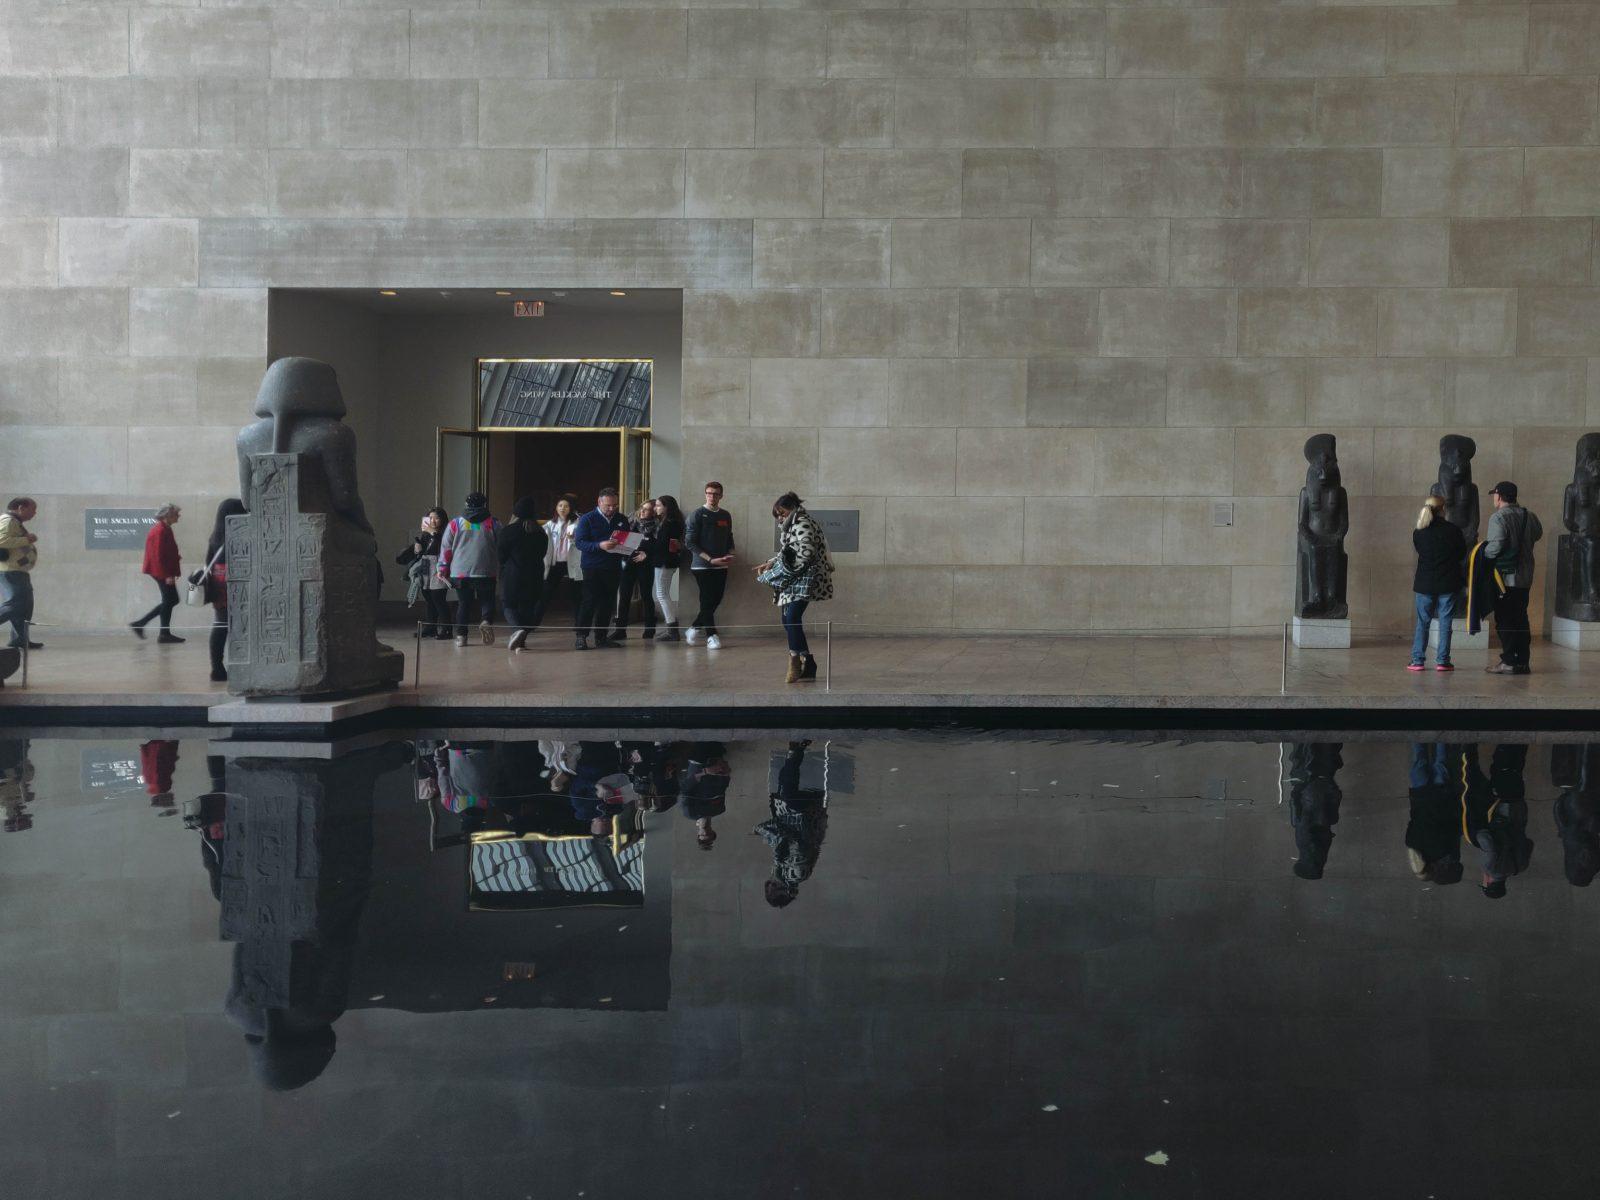 eaqqktijdjy - Metropolitan Museum of Art